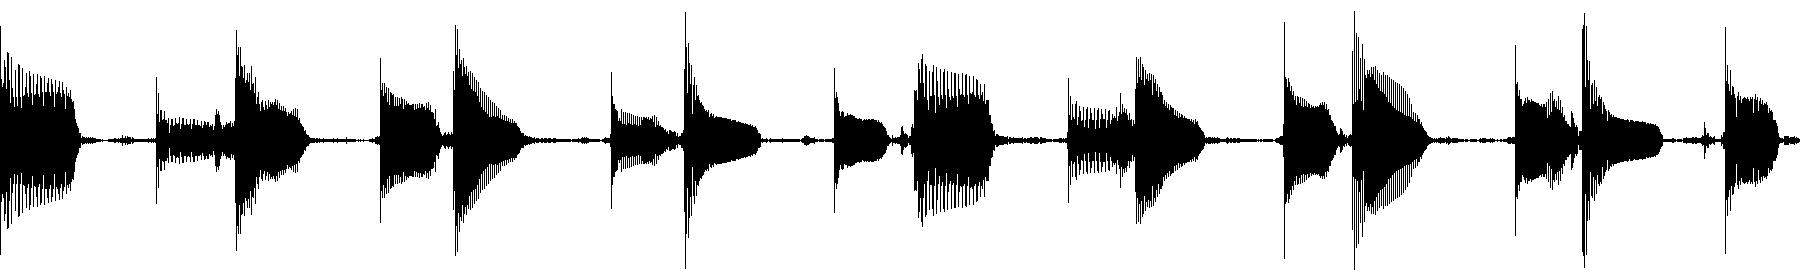 guitarreggae02 120